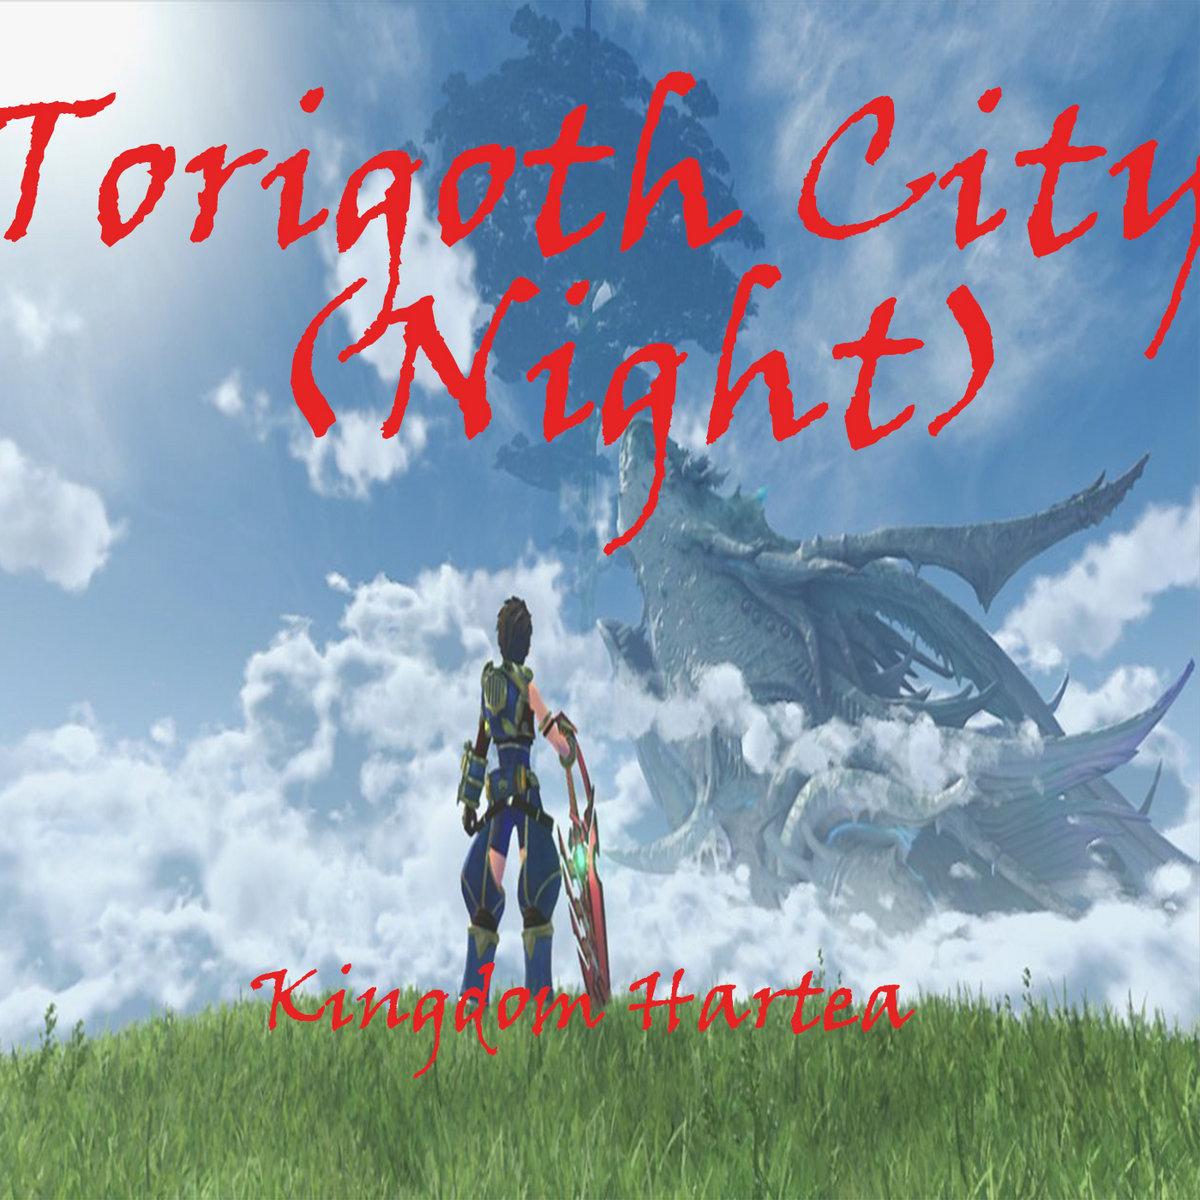 Xenoblade Chronicles 2 Torigoth City Nightreggae Cover Xavier